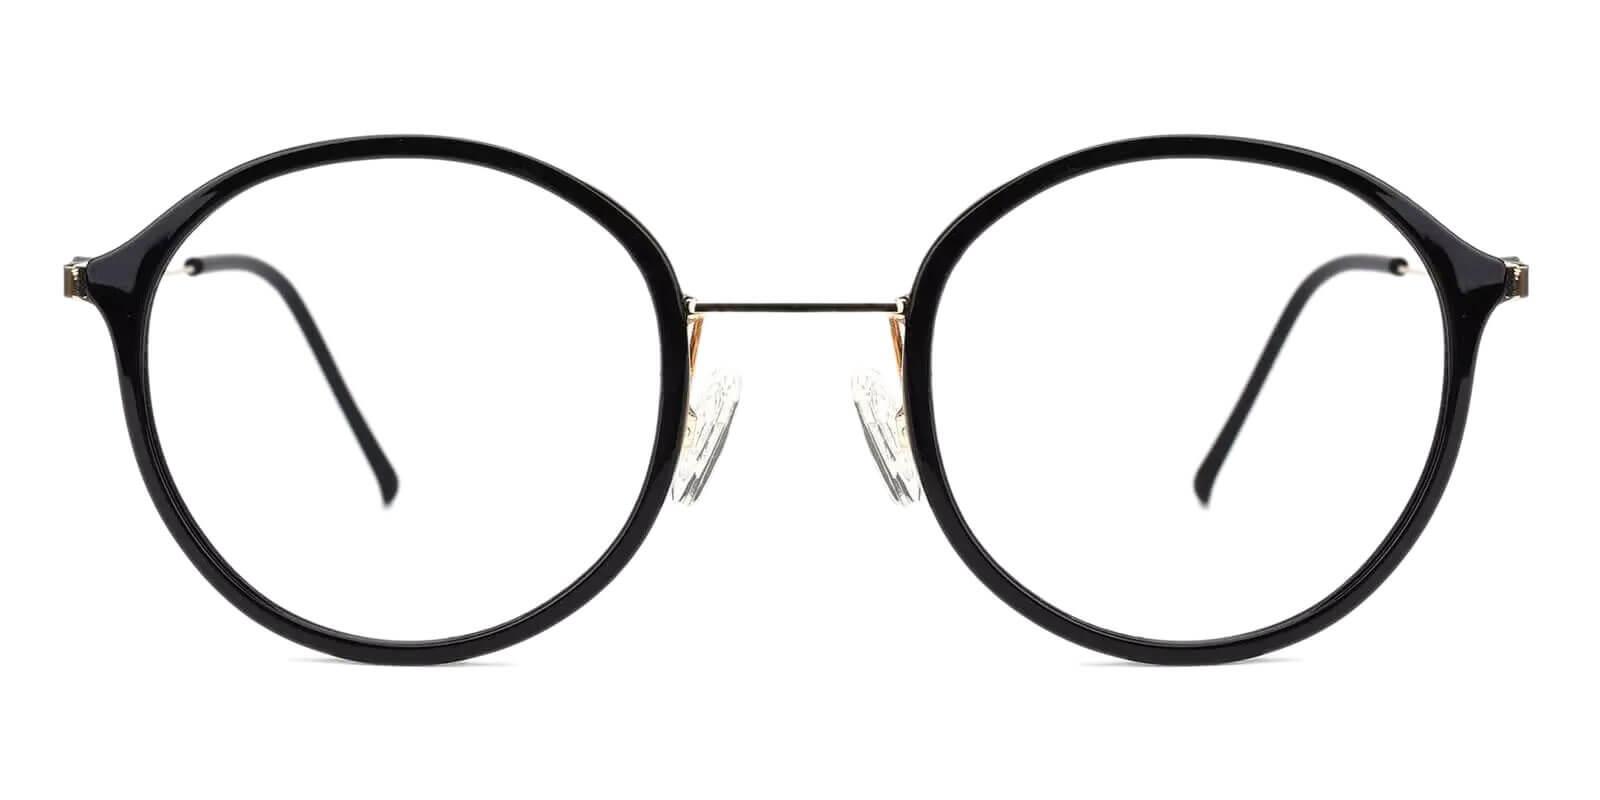 Macau Black Metal , TR Lightweight , NosePads , Eyeglasses Frames from ABBE Glasses